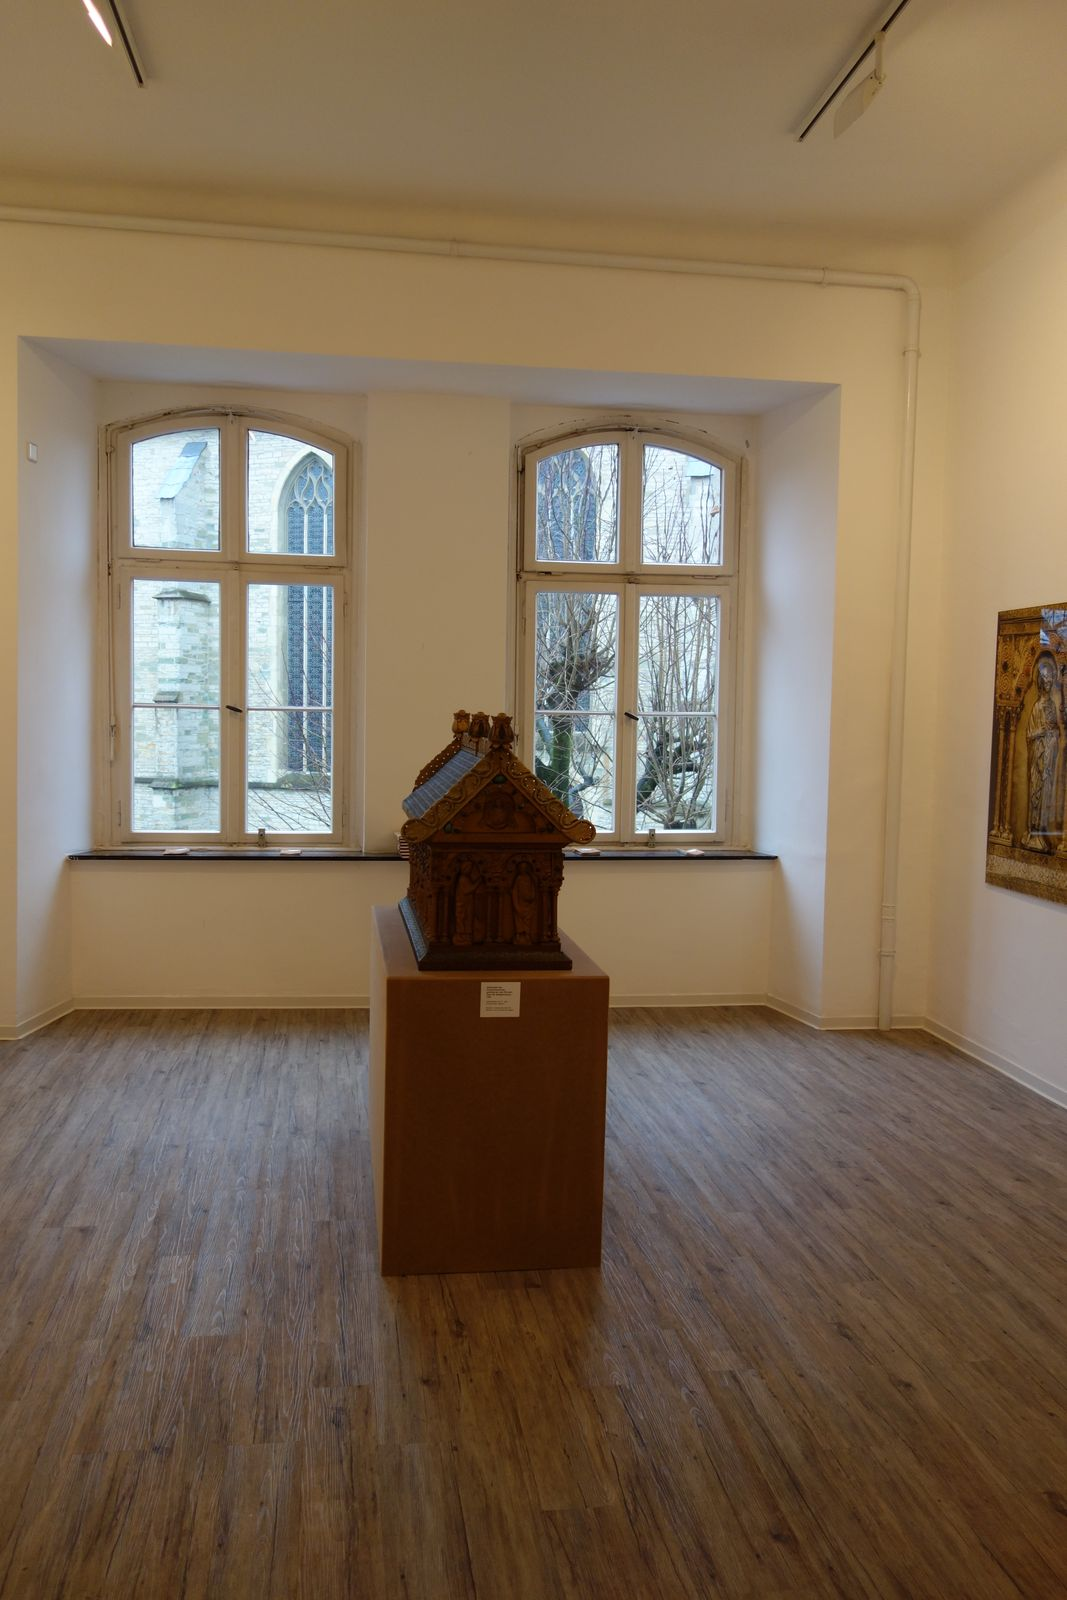 Ausstellung Beckum_Schrein I